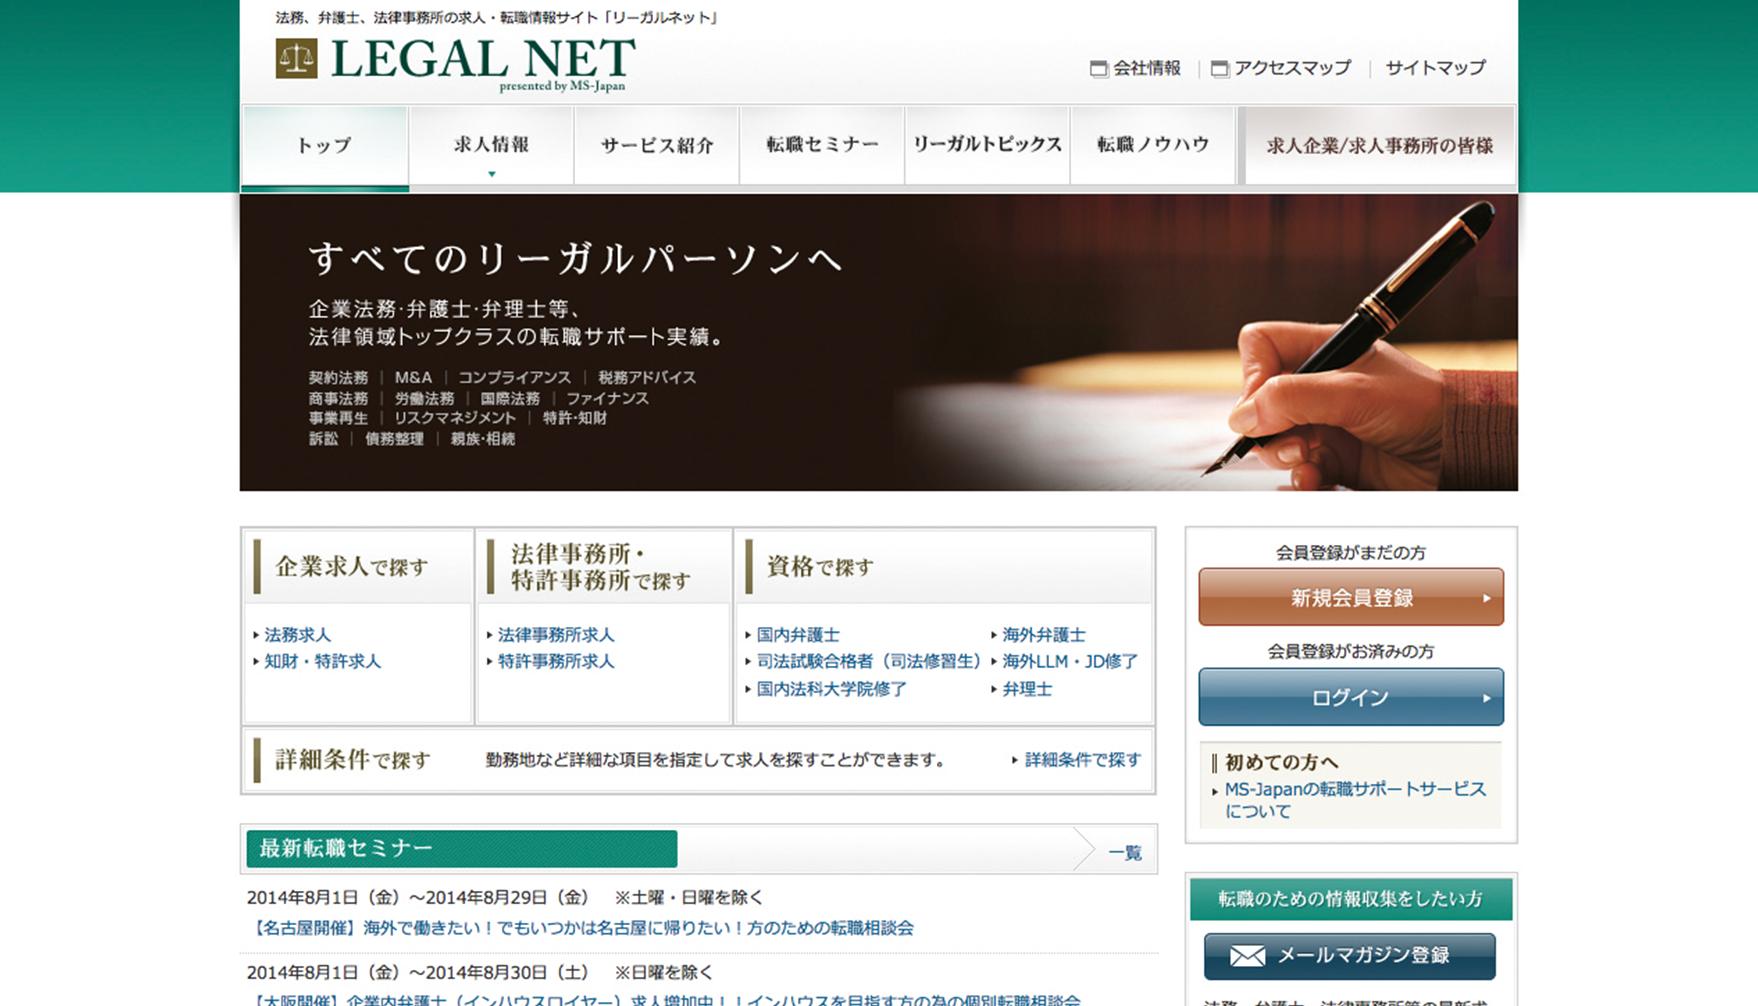 thumbnail_pc_legalnet.png